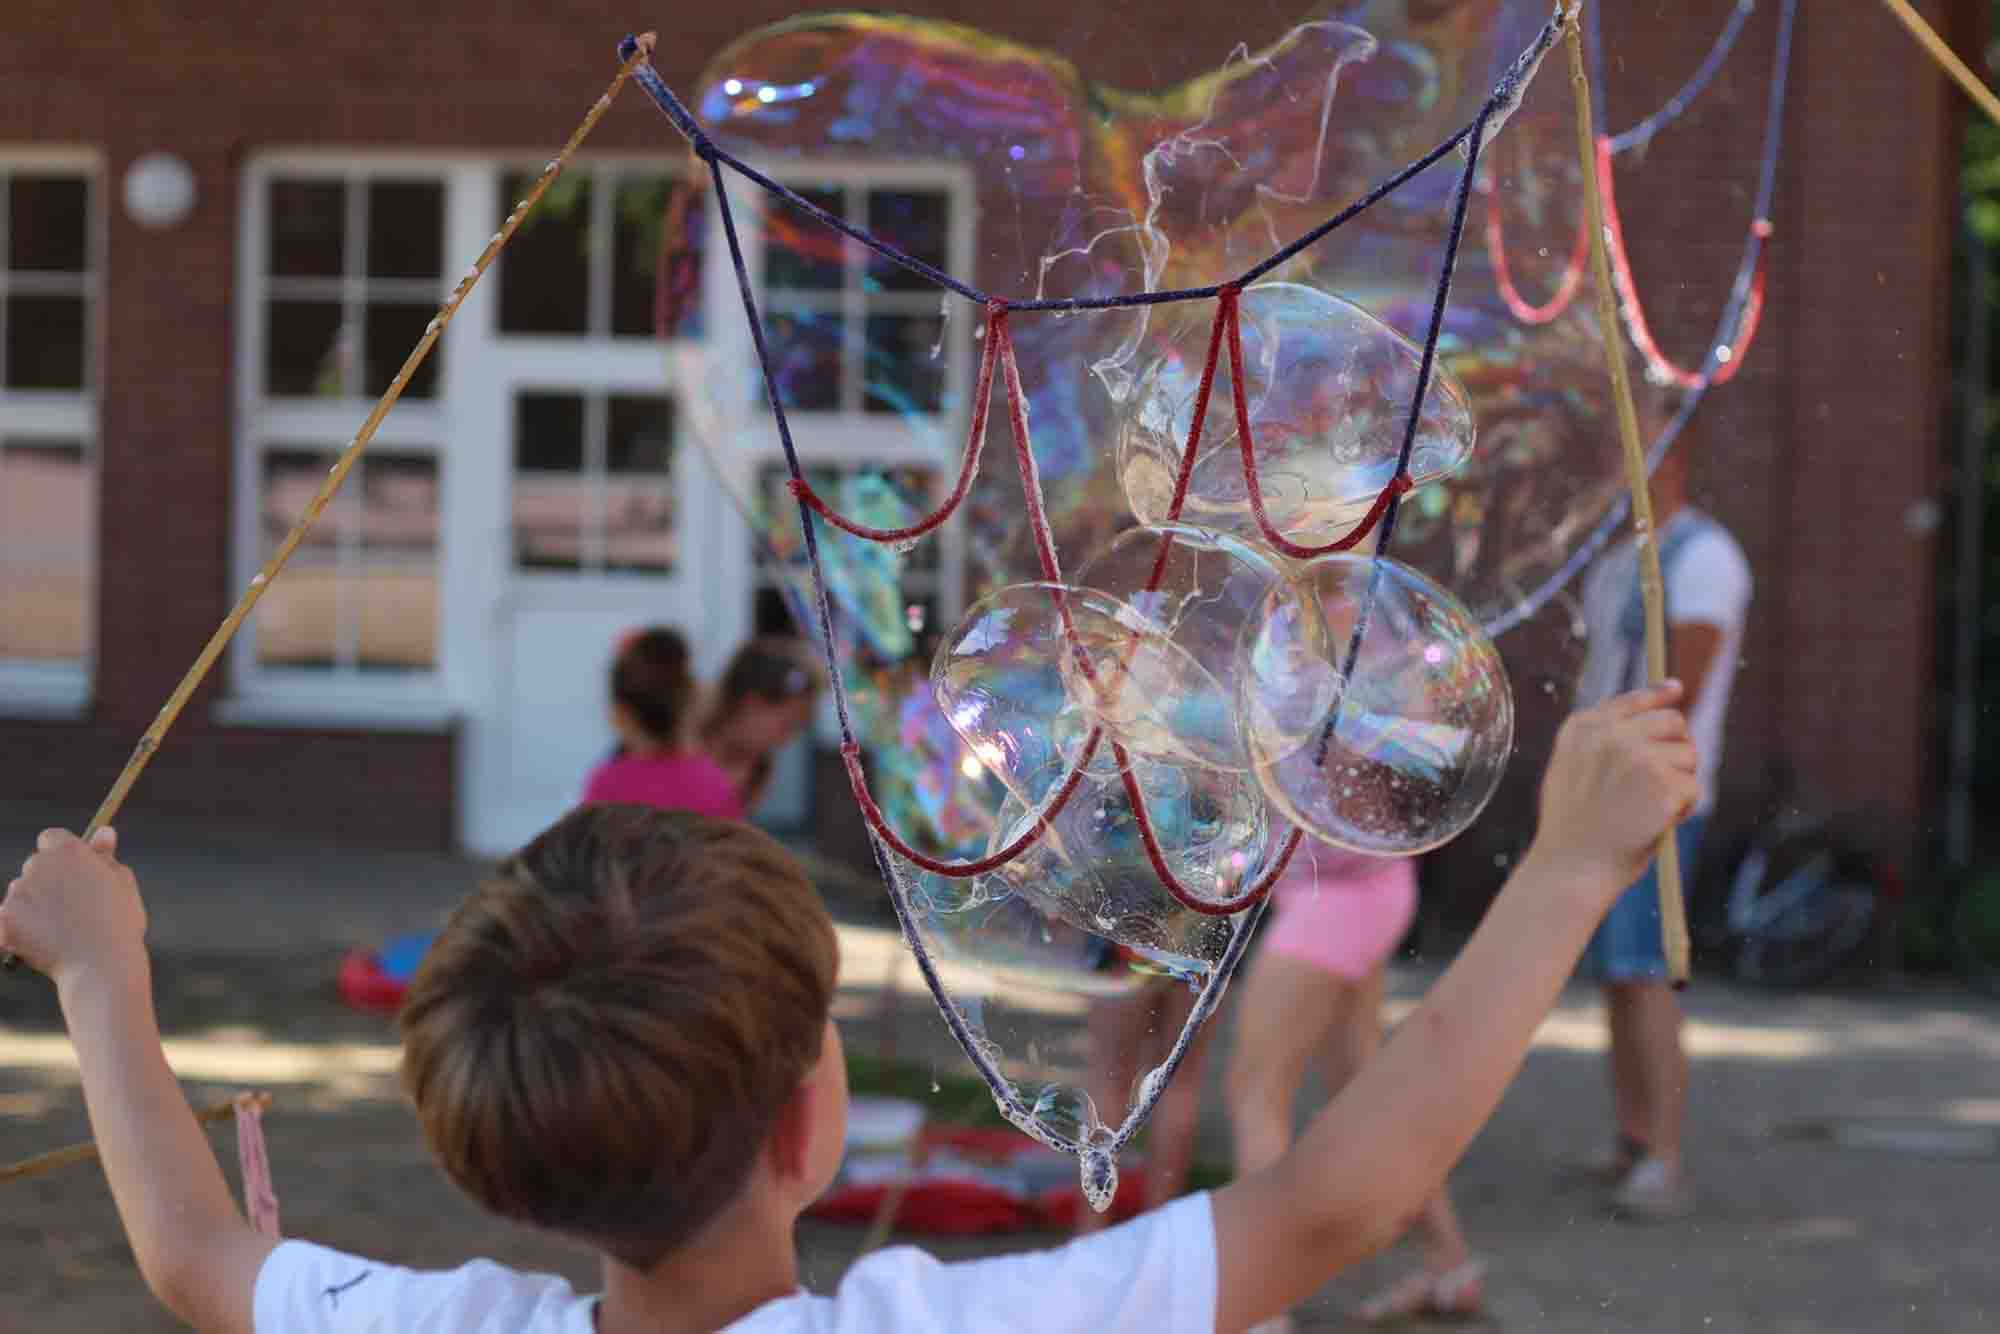 Spielzeug, Riesenseifenblasen, Produkte, Seifenblasen